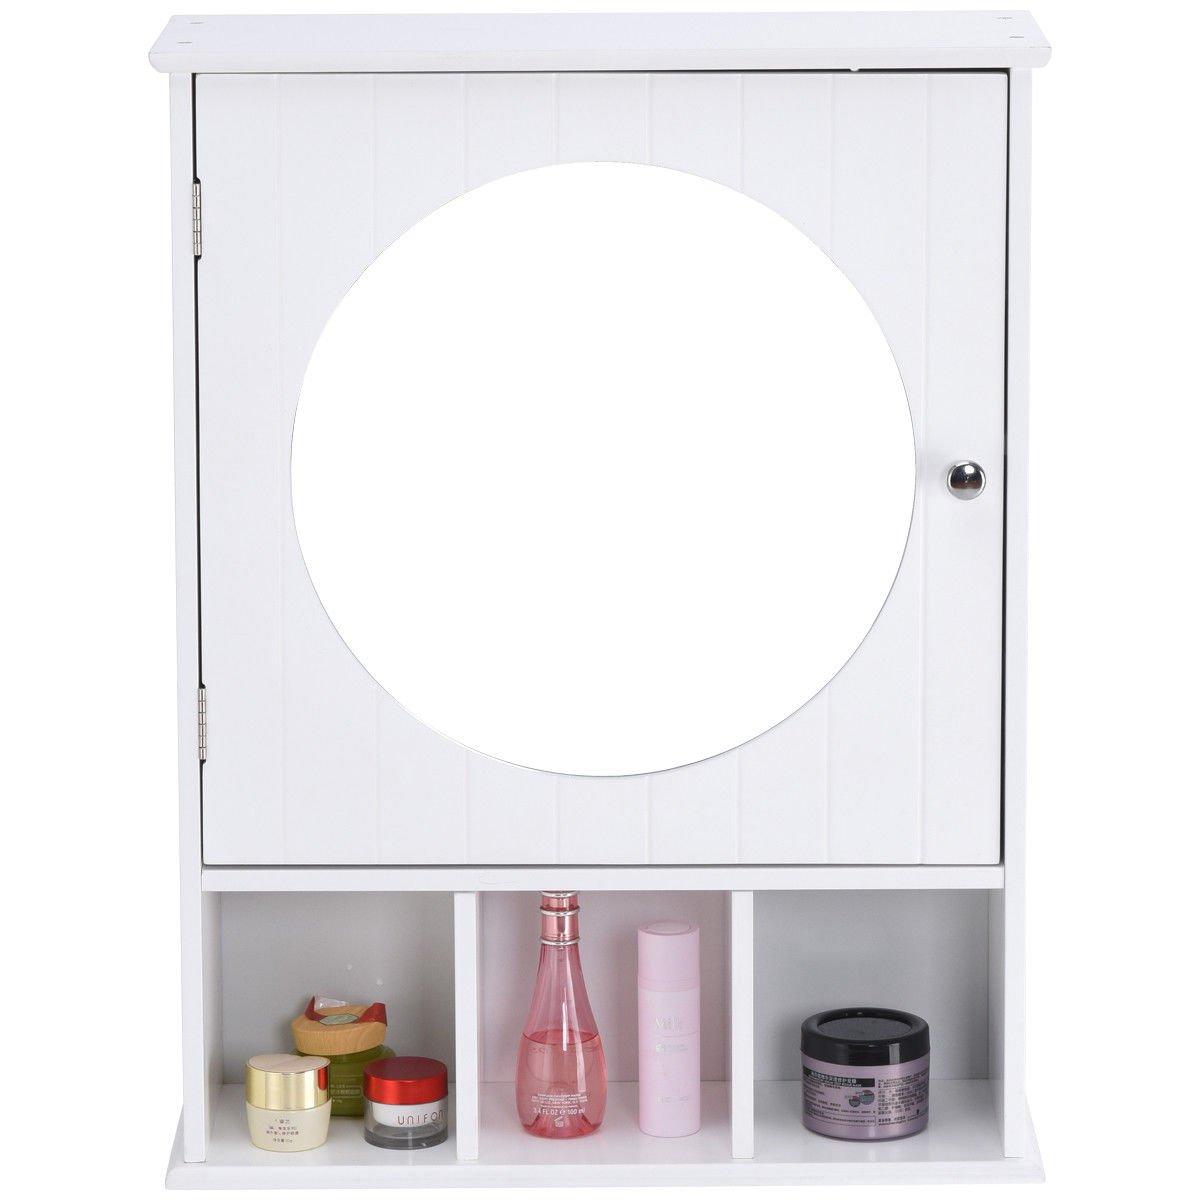 New Bathroom Cabinet Mirror Door Wall Mount Storage Wood Shelf White Finish